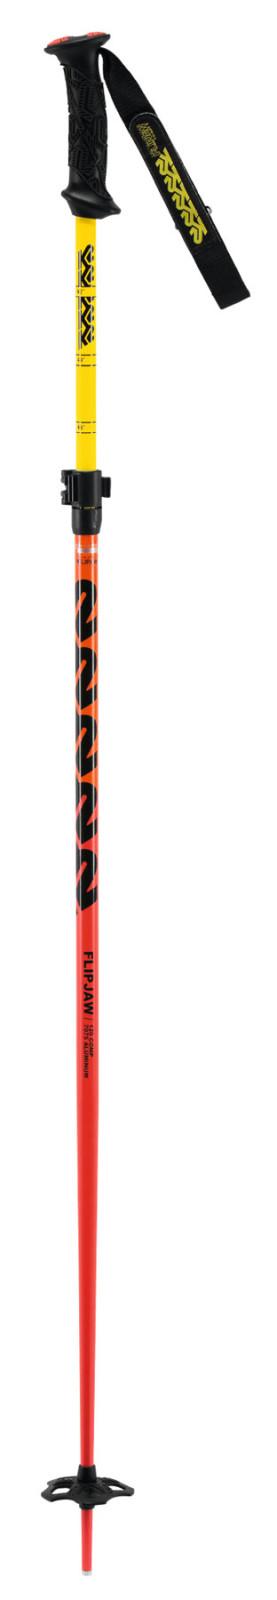 K2 FlipJaw 120 - oranžová